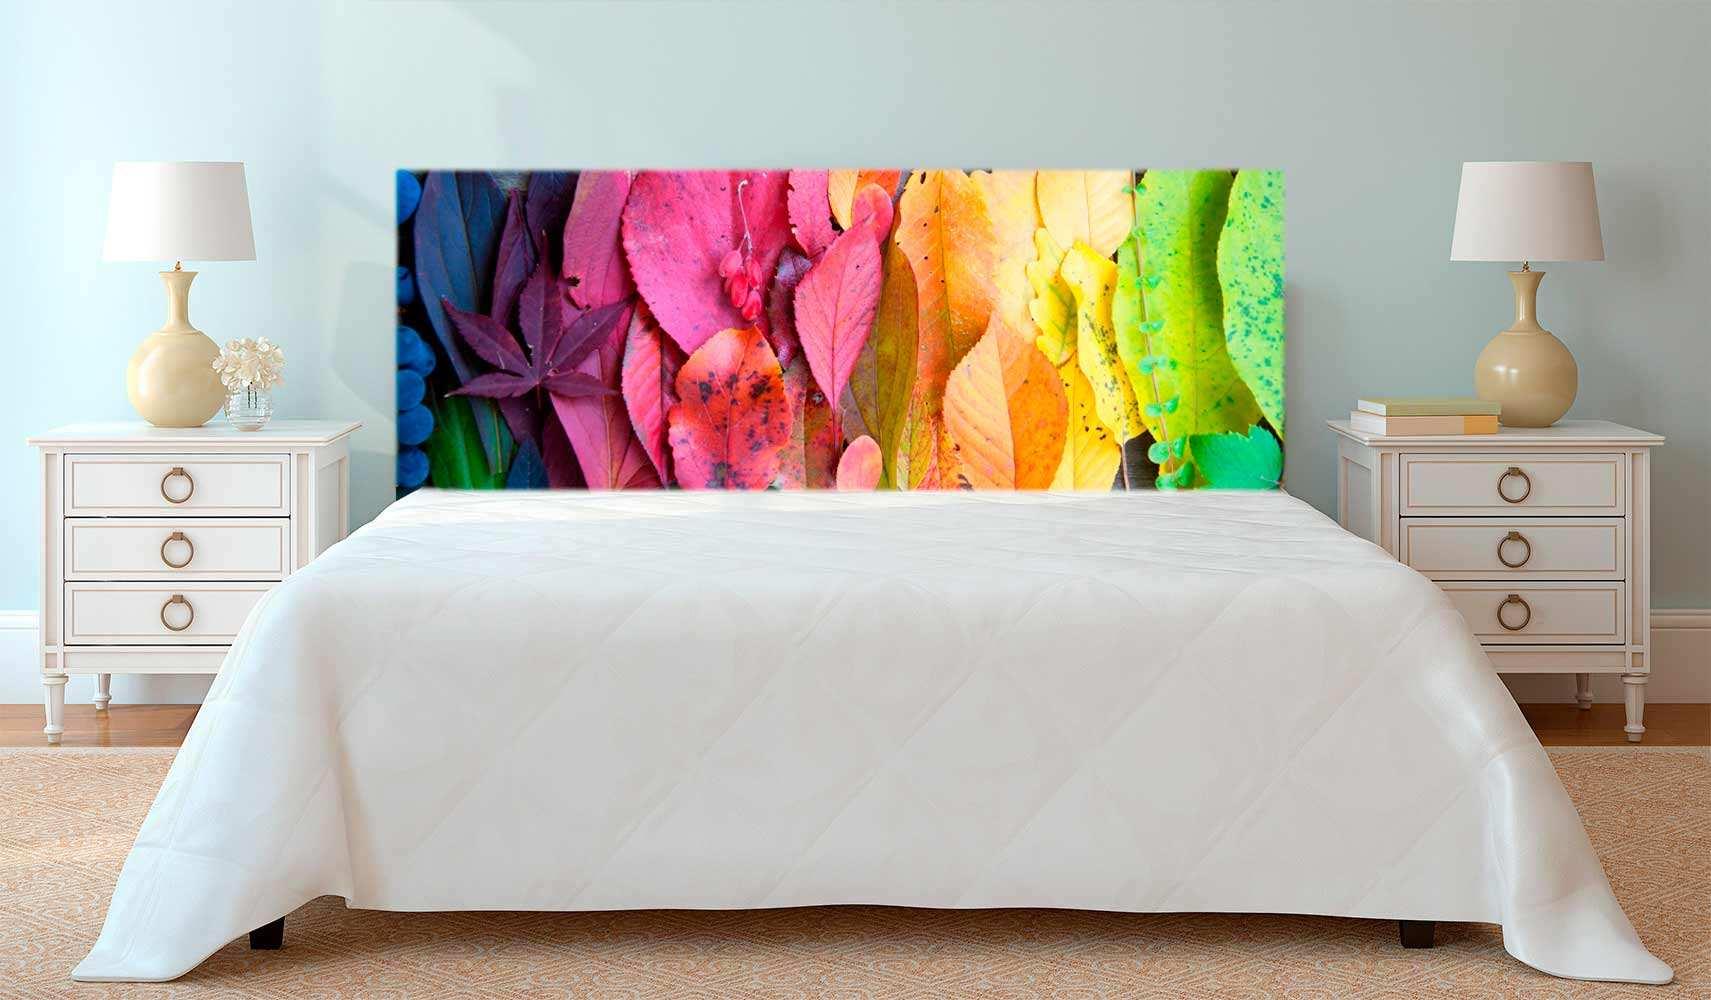 Cabecero Cama Hojas Escala Color | Carteles XXL - Impresión carteleria publicitaria